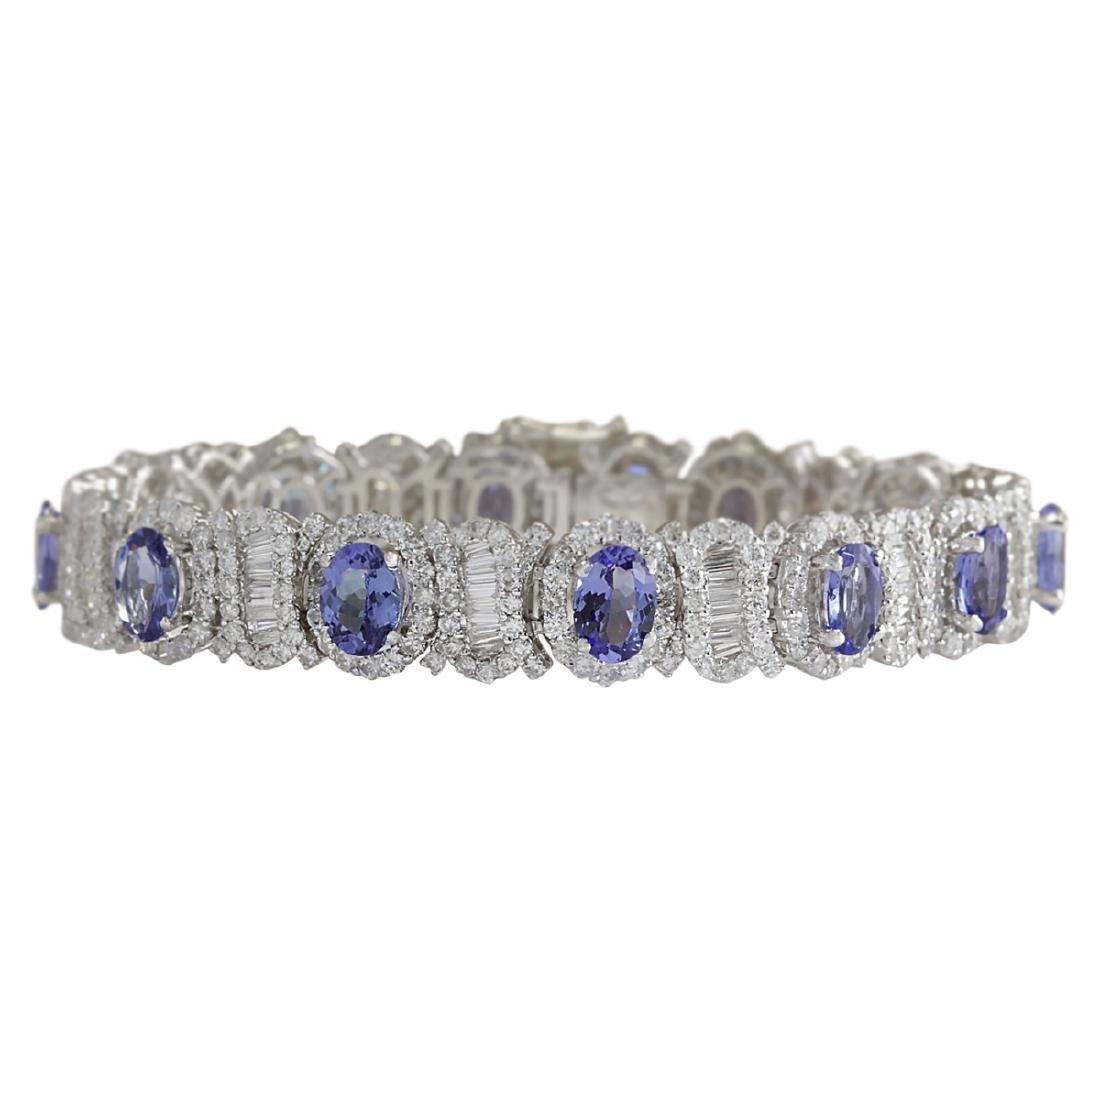 24.70 CTW Natural Tanzanite And Diamond Bracelet In 18K